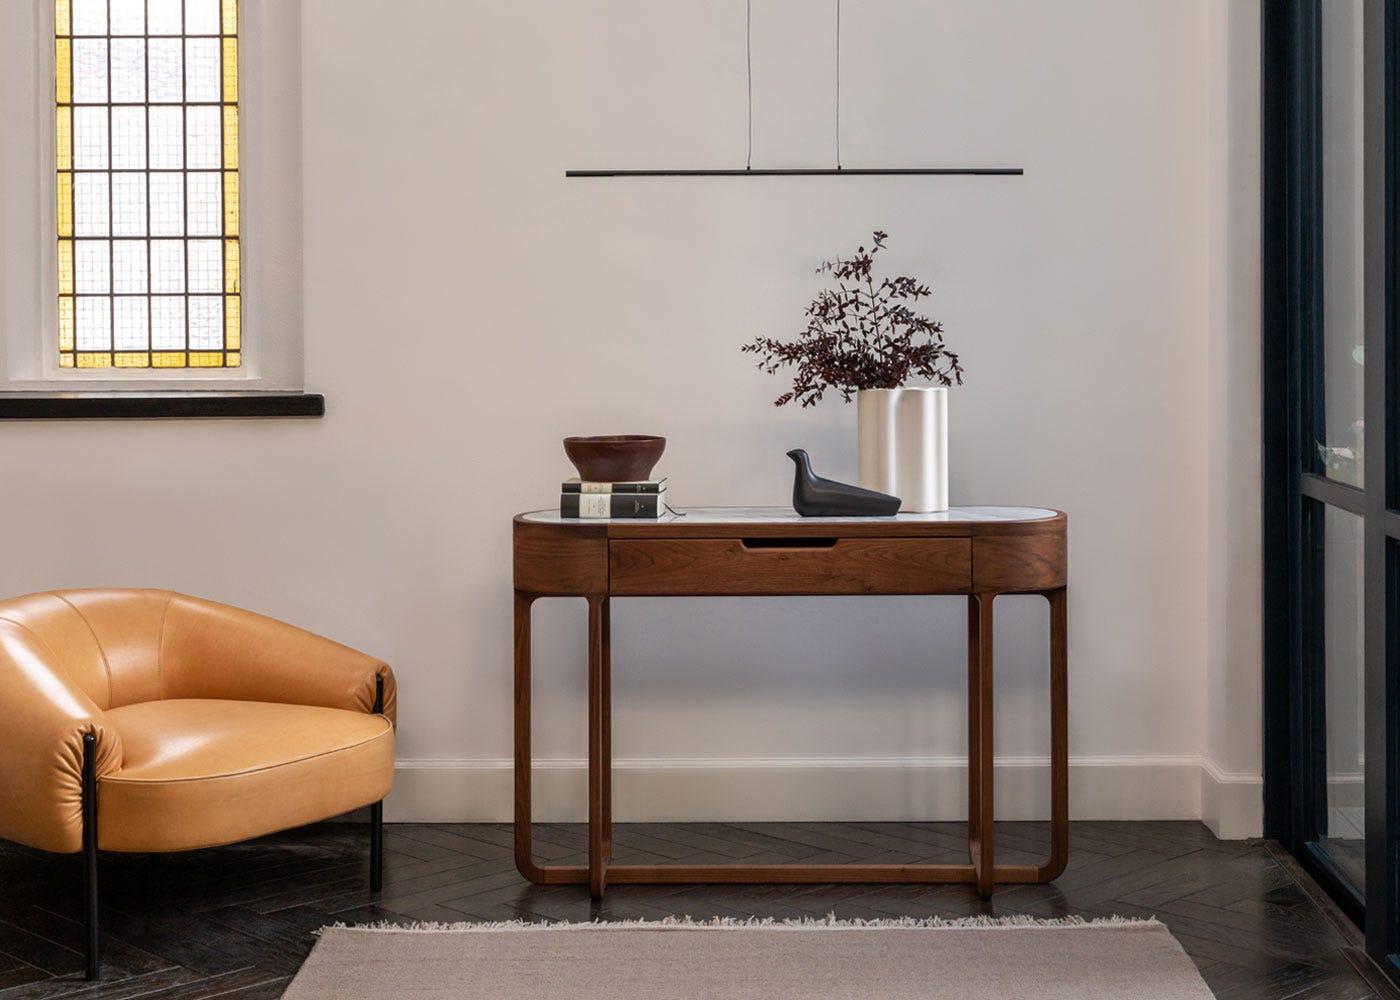 As shown: Anais console table, Saber pendant light black.